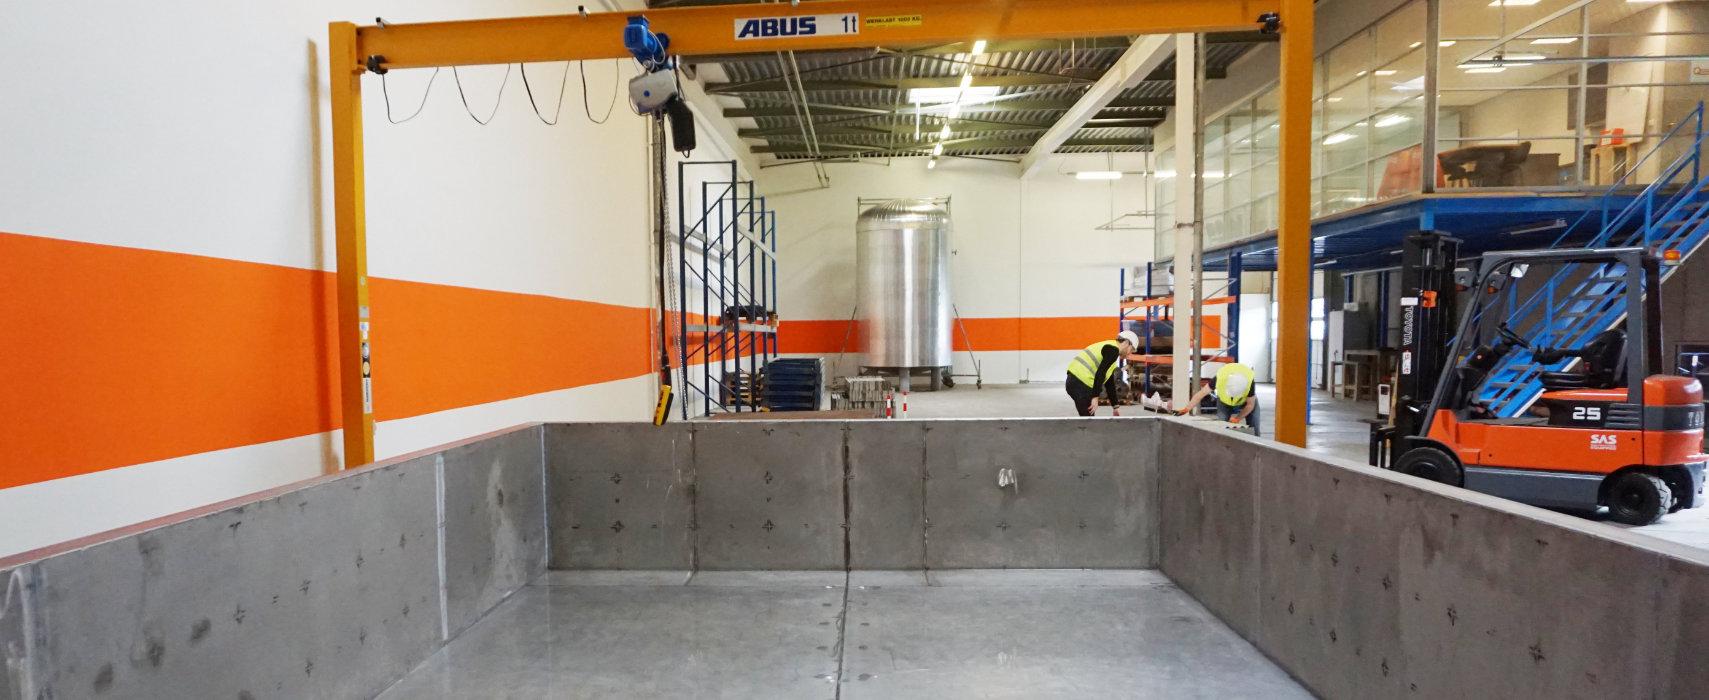 Quasset Test Facility QTF robotics water basin